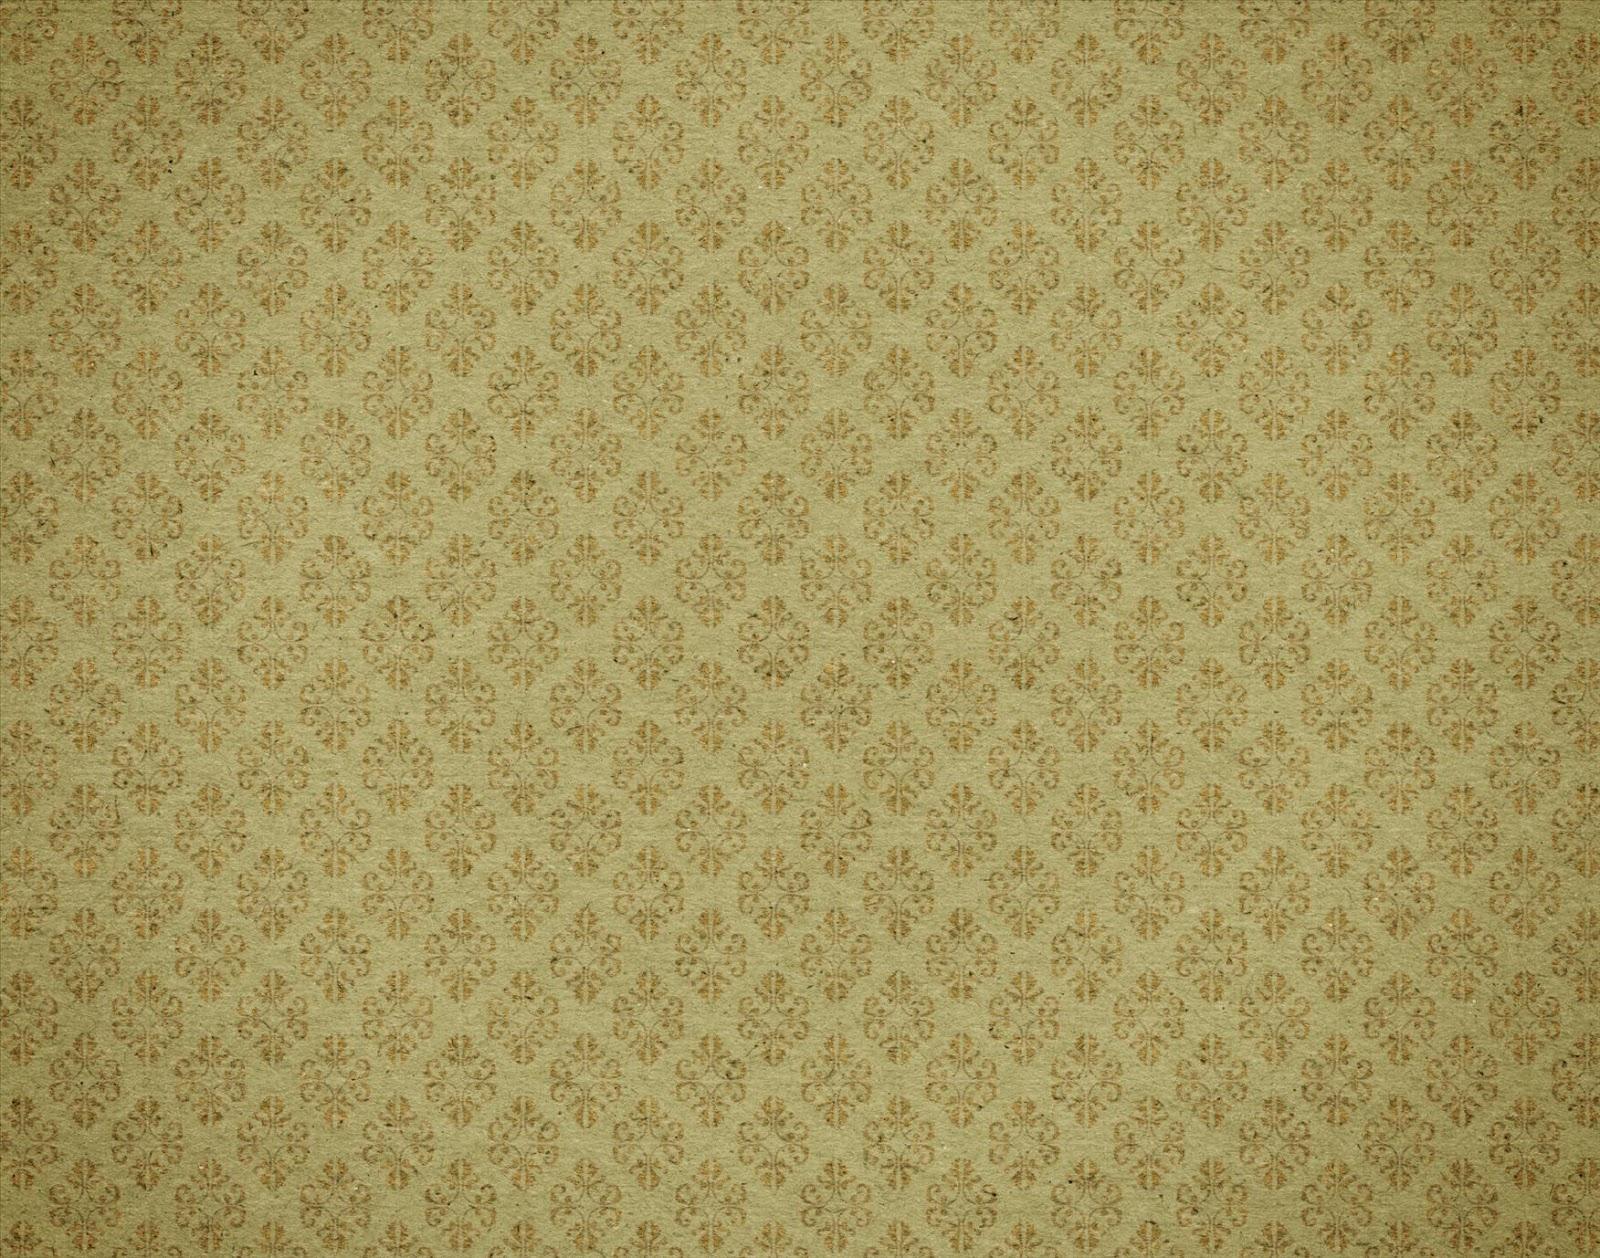 vintage desktop wallpapers vintage wallpapers vintage wallpaper 1600x1258